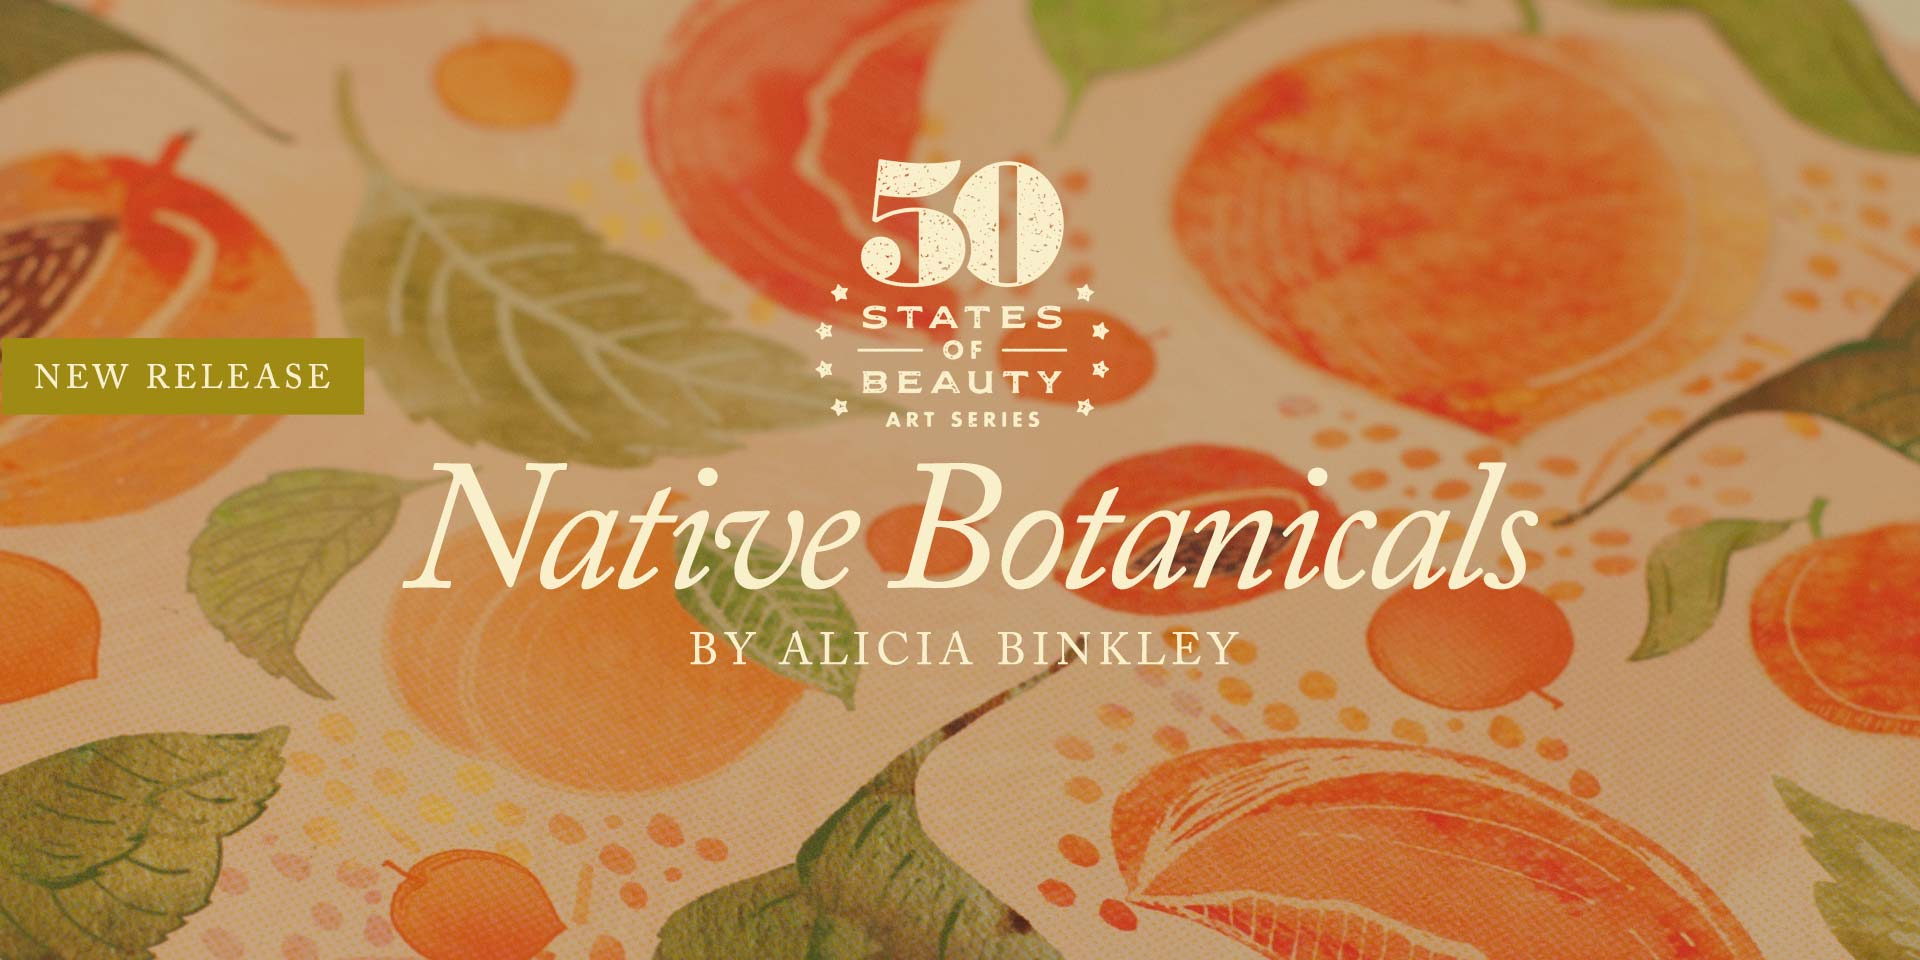 Native-Botanicals-slideshow-georgia-1920x960.jpg